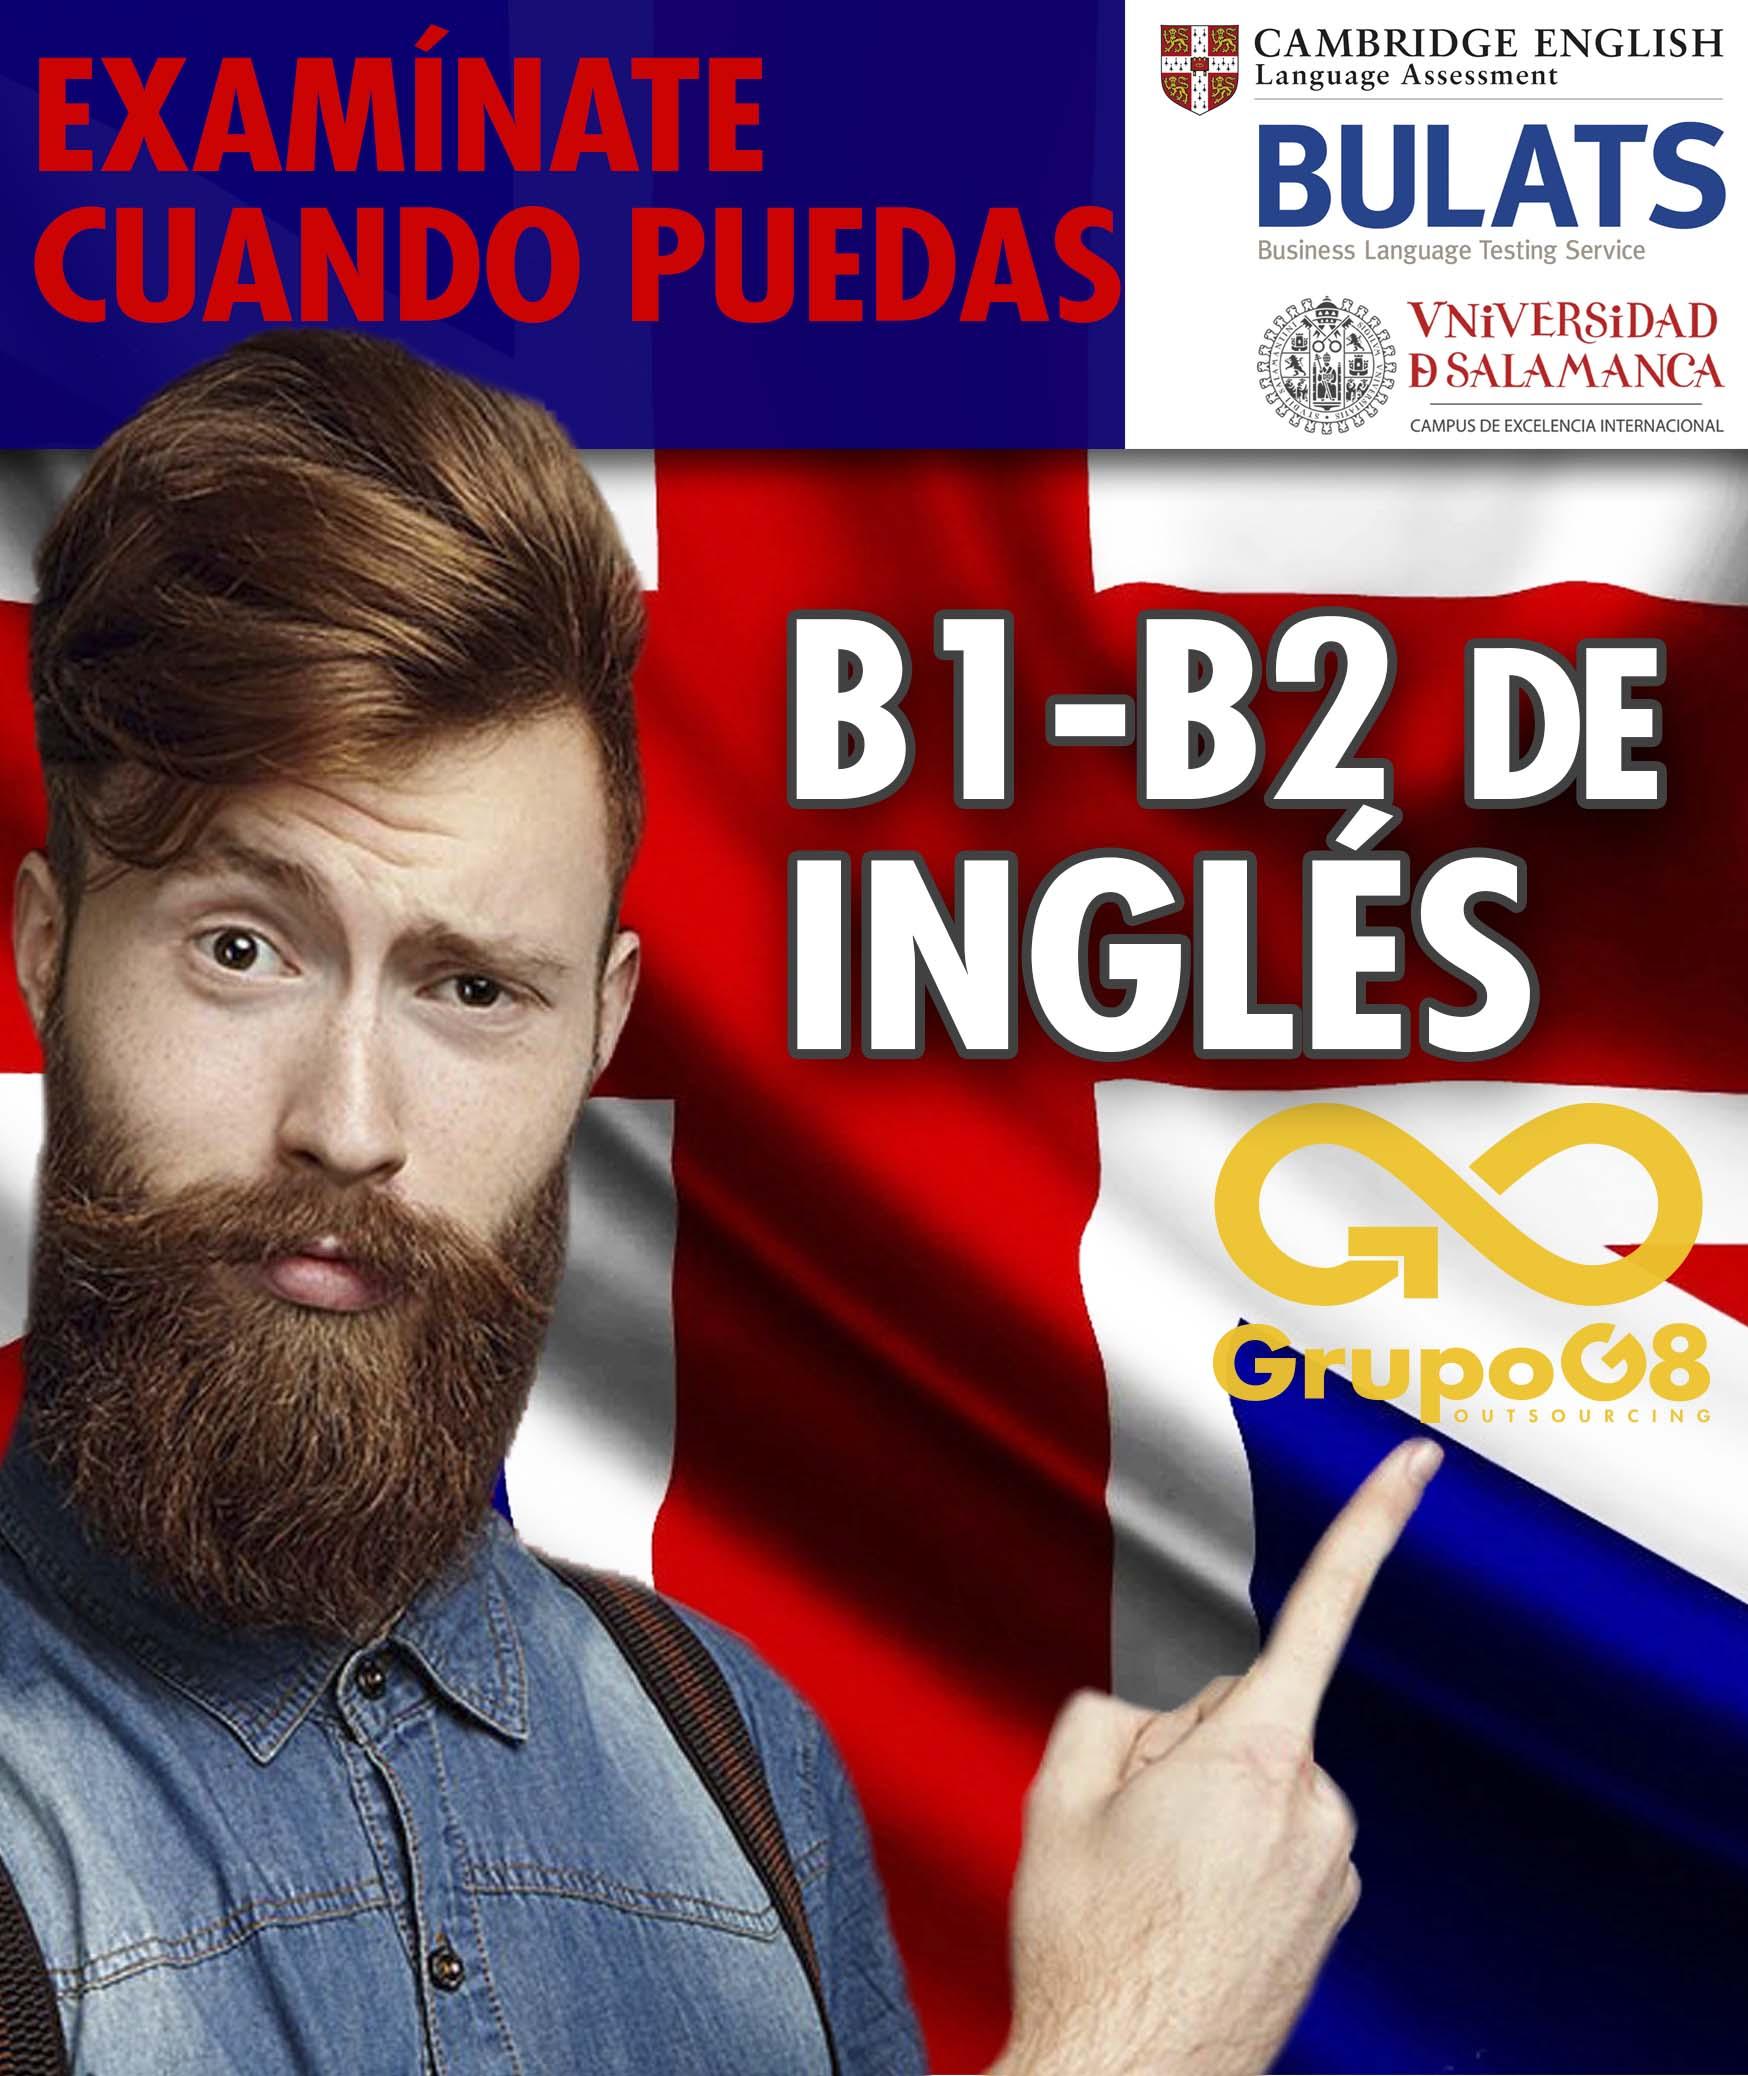 CURSO DE INGLÉS: PREPARACIÓN B1/B2 CAMBRIDGE BULATS